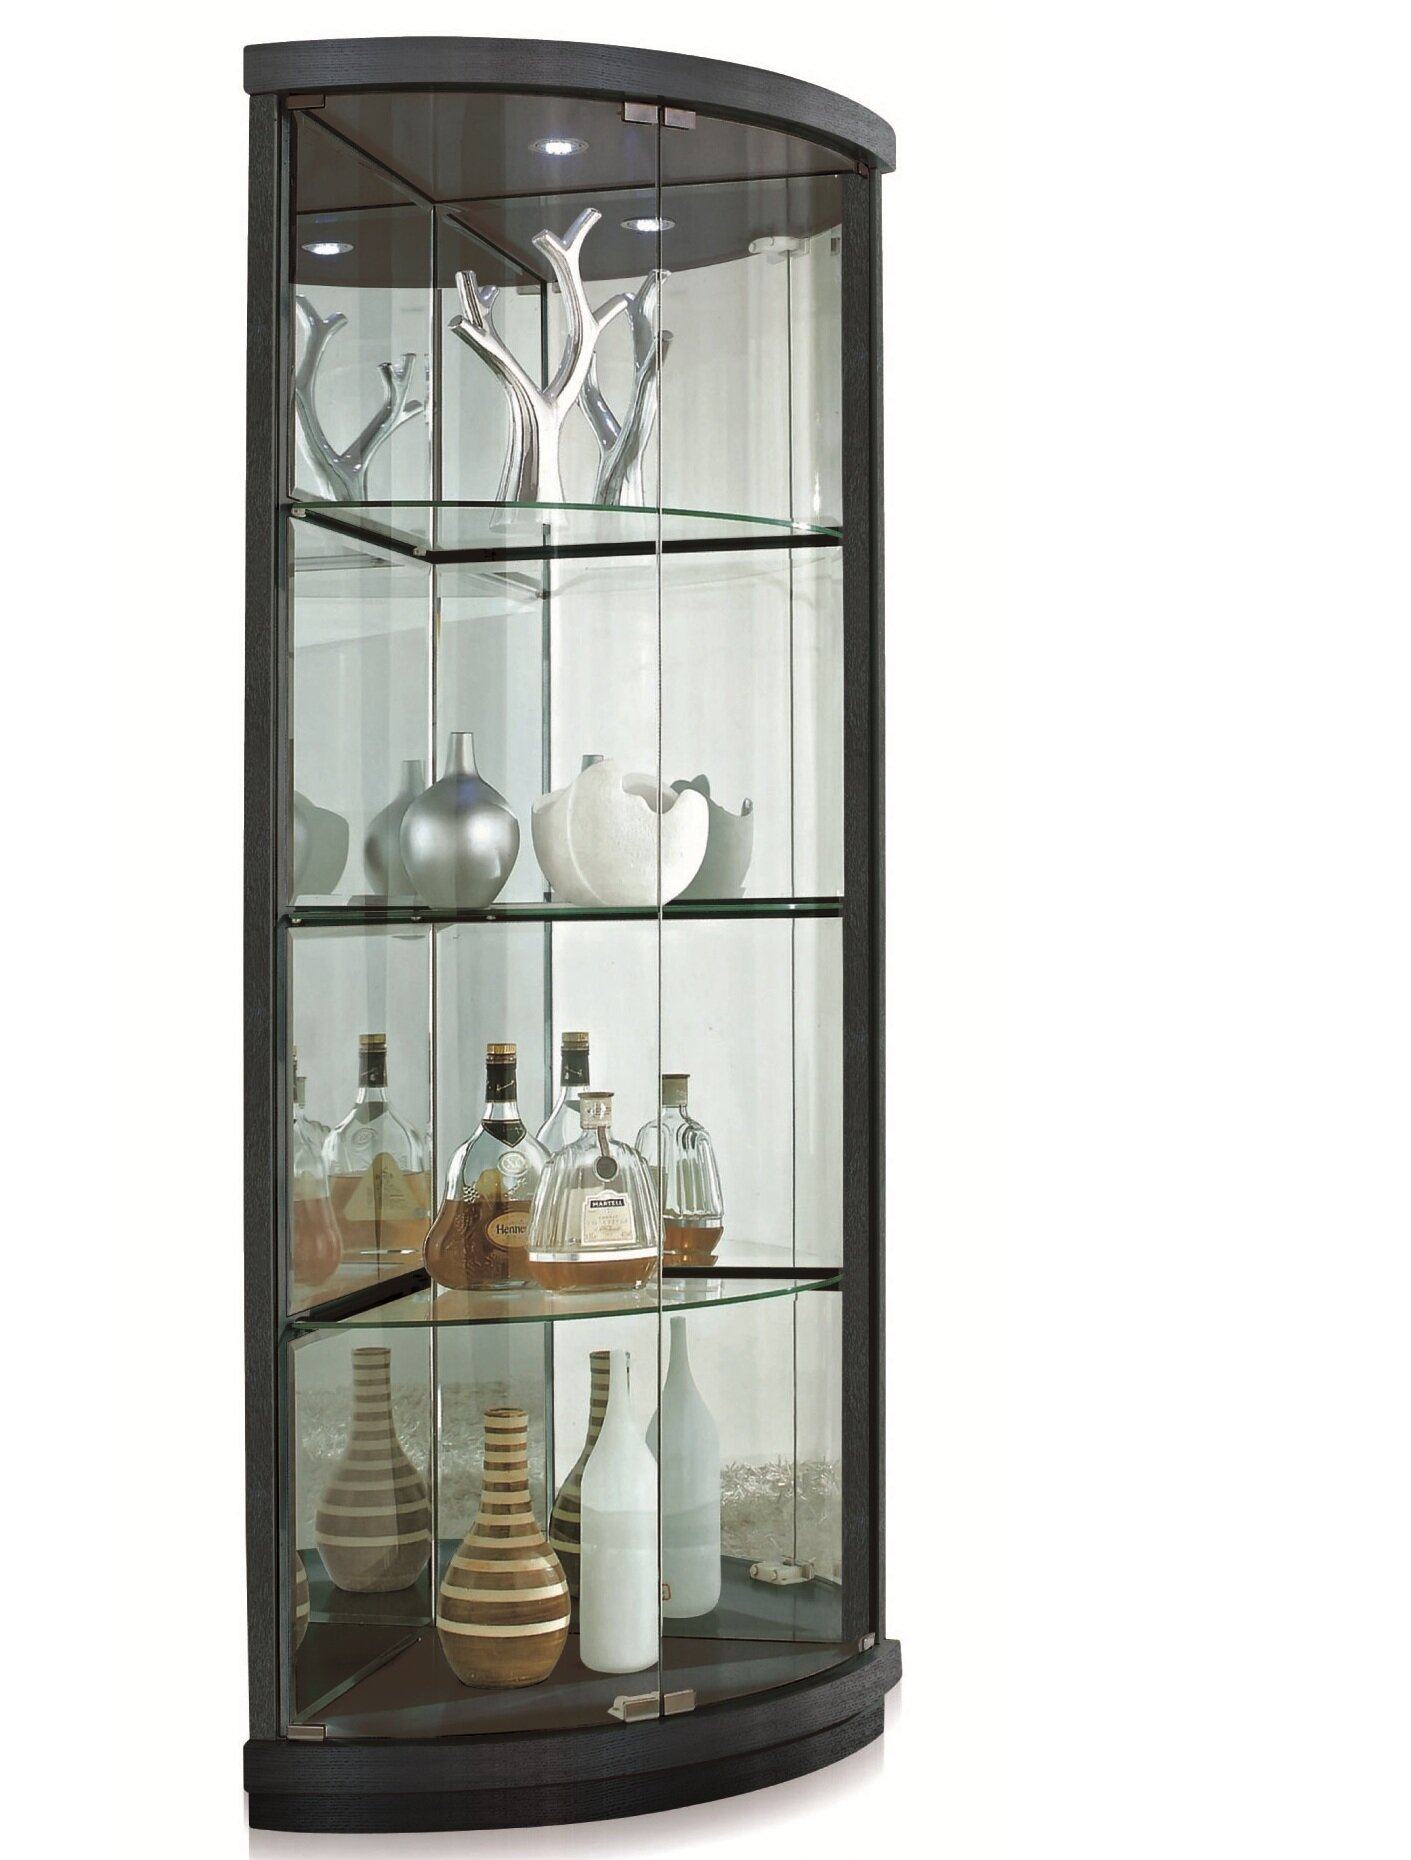 new spec lighted corner curio cabinet reviews wayfair rh wayfair com Pulaski Corner Curio Cabinets Corner Curio Cabinet with Lock